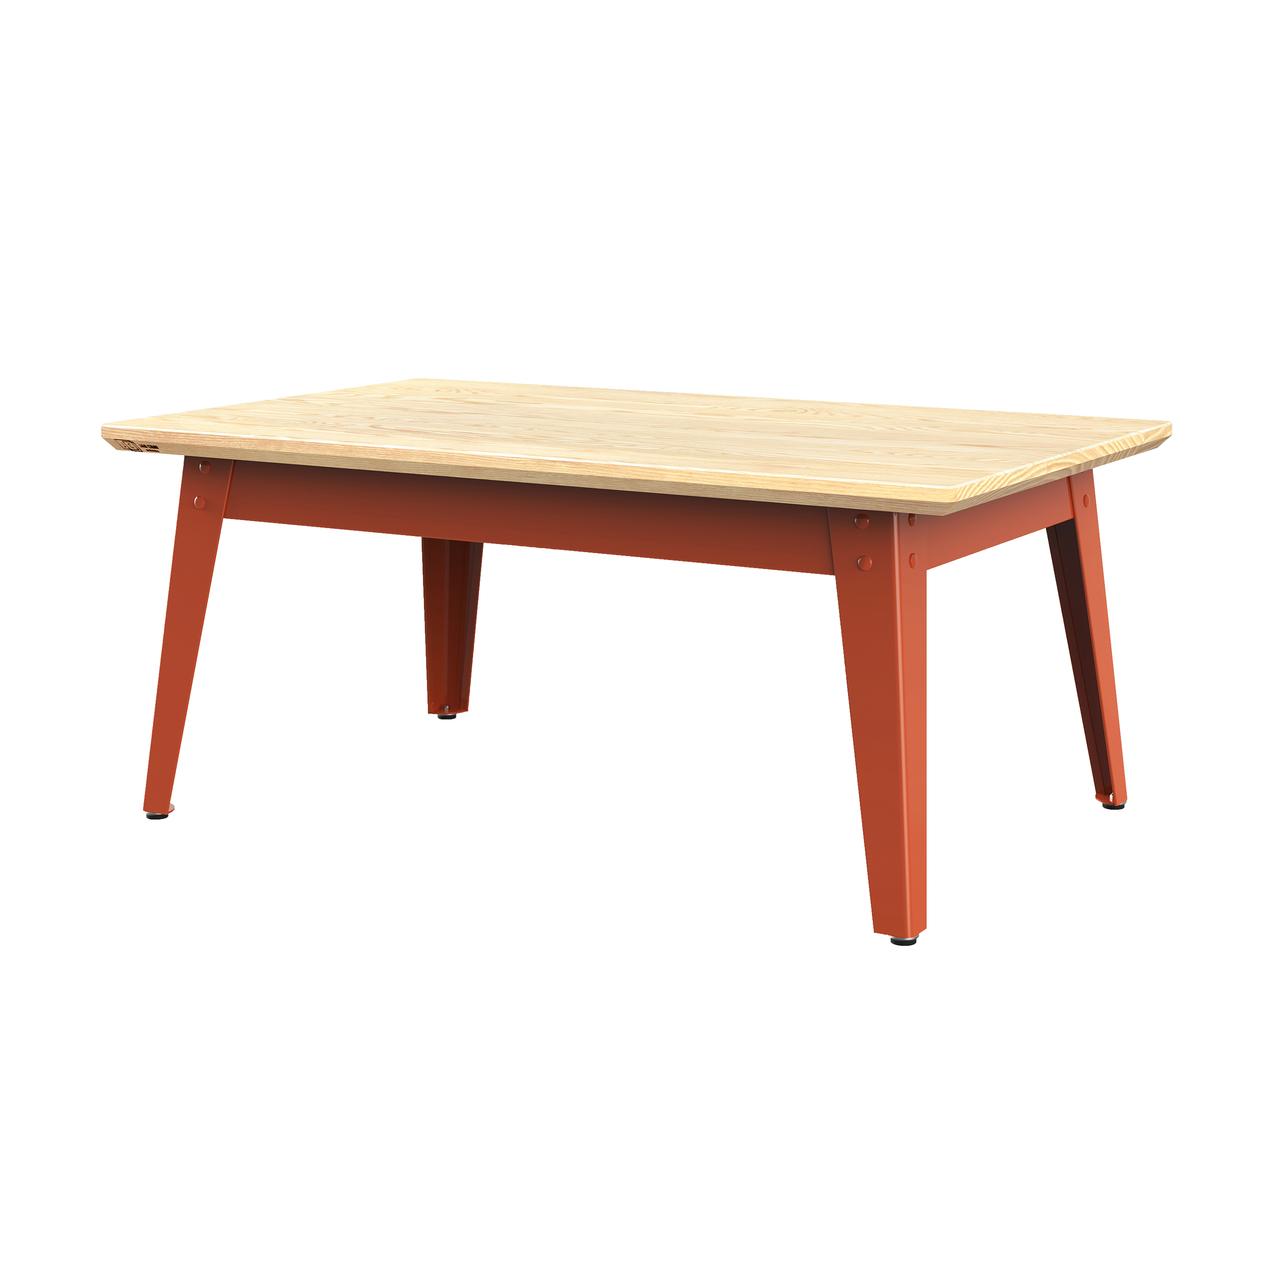 Jan Cray 6Grad Couchtisch Holz Rotorange, Eschenholz geölt, B: 55 cm / L: 90 cm / H: 40 cm